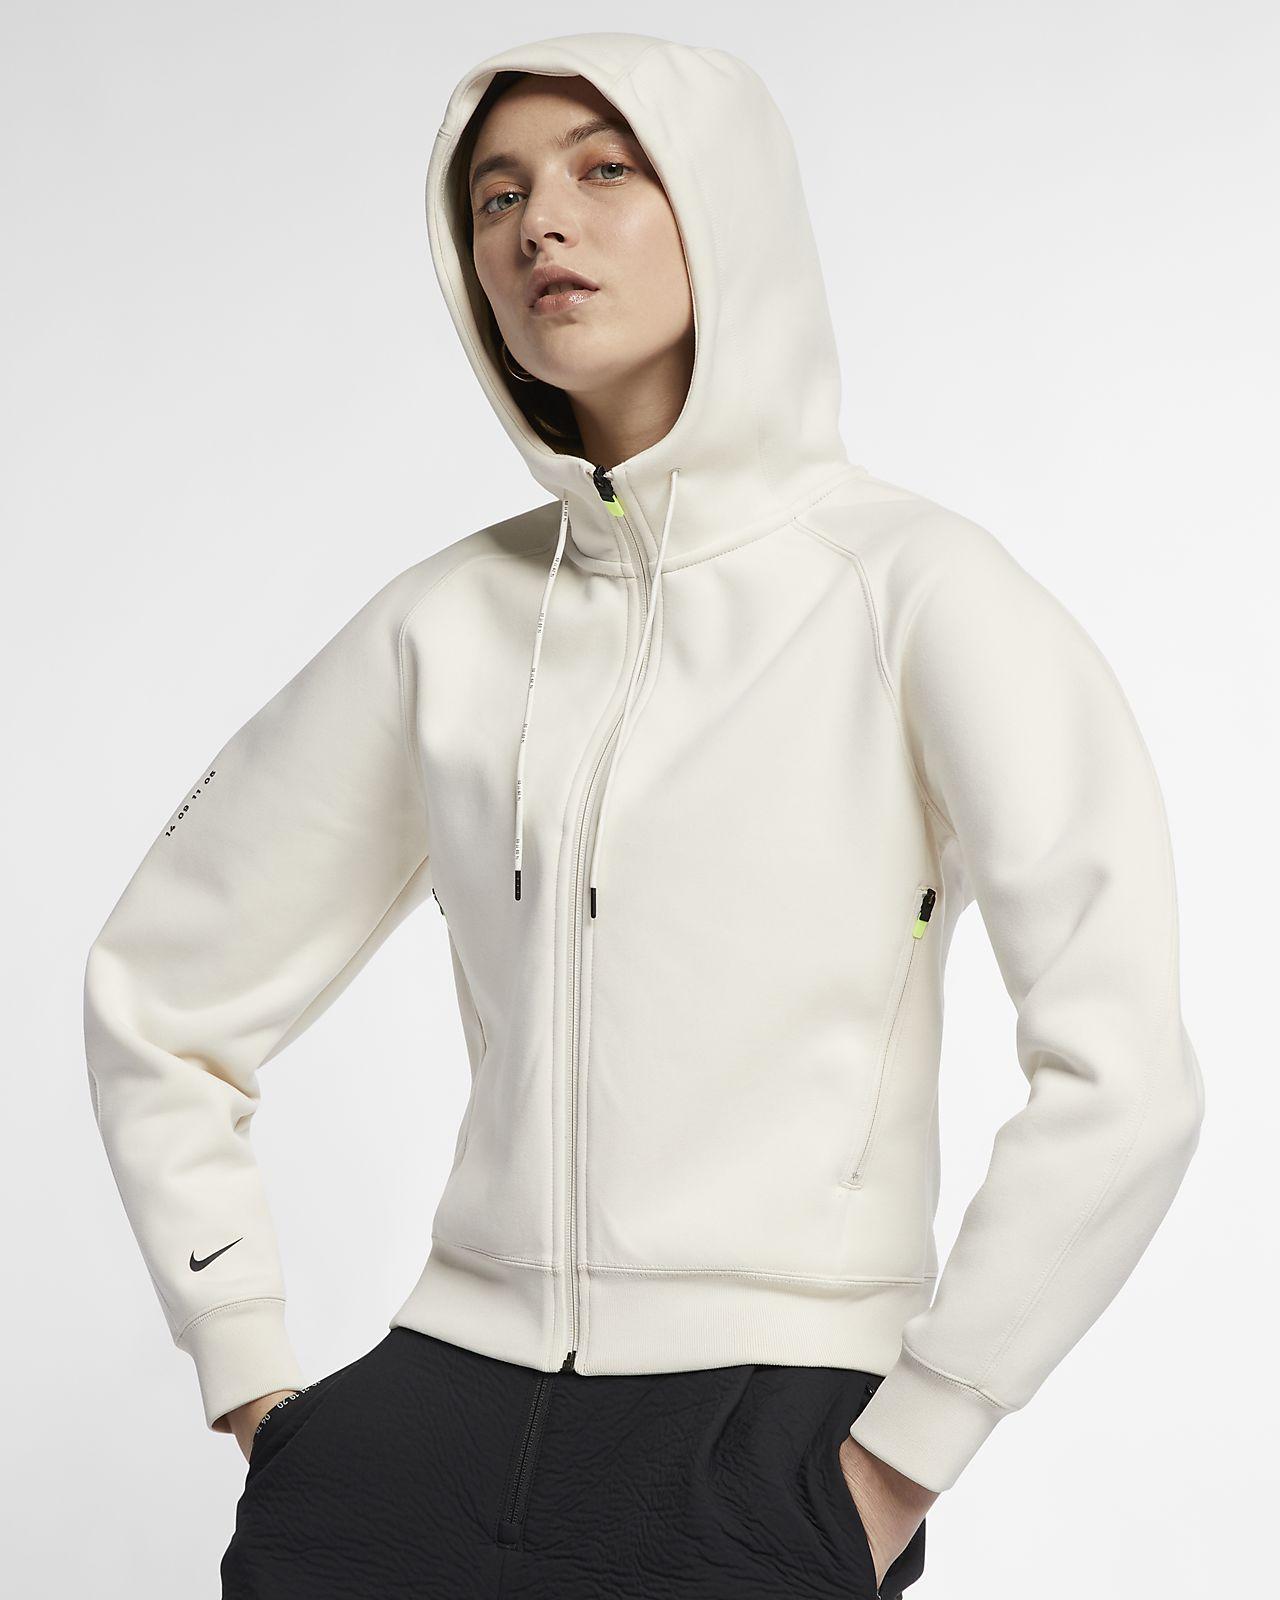 Nike Sportswear Tech Pack Sudadera con capucha de tejido Fleece con cremallera completa - Mujer